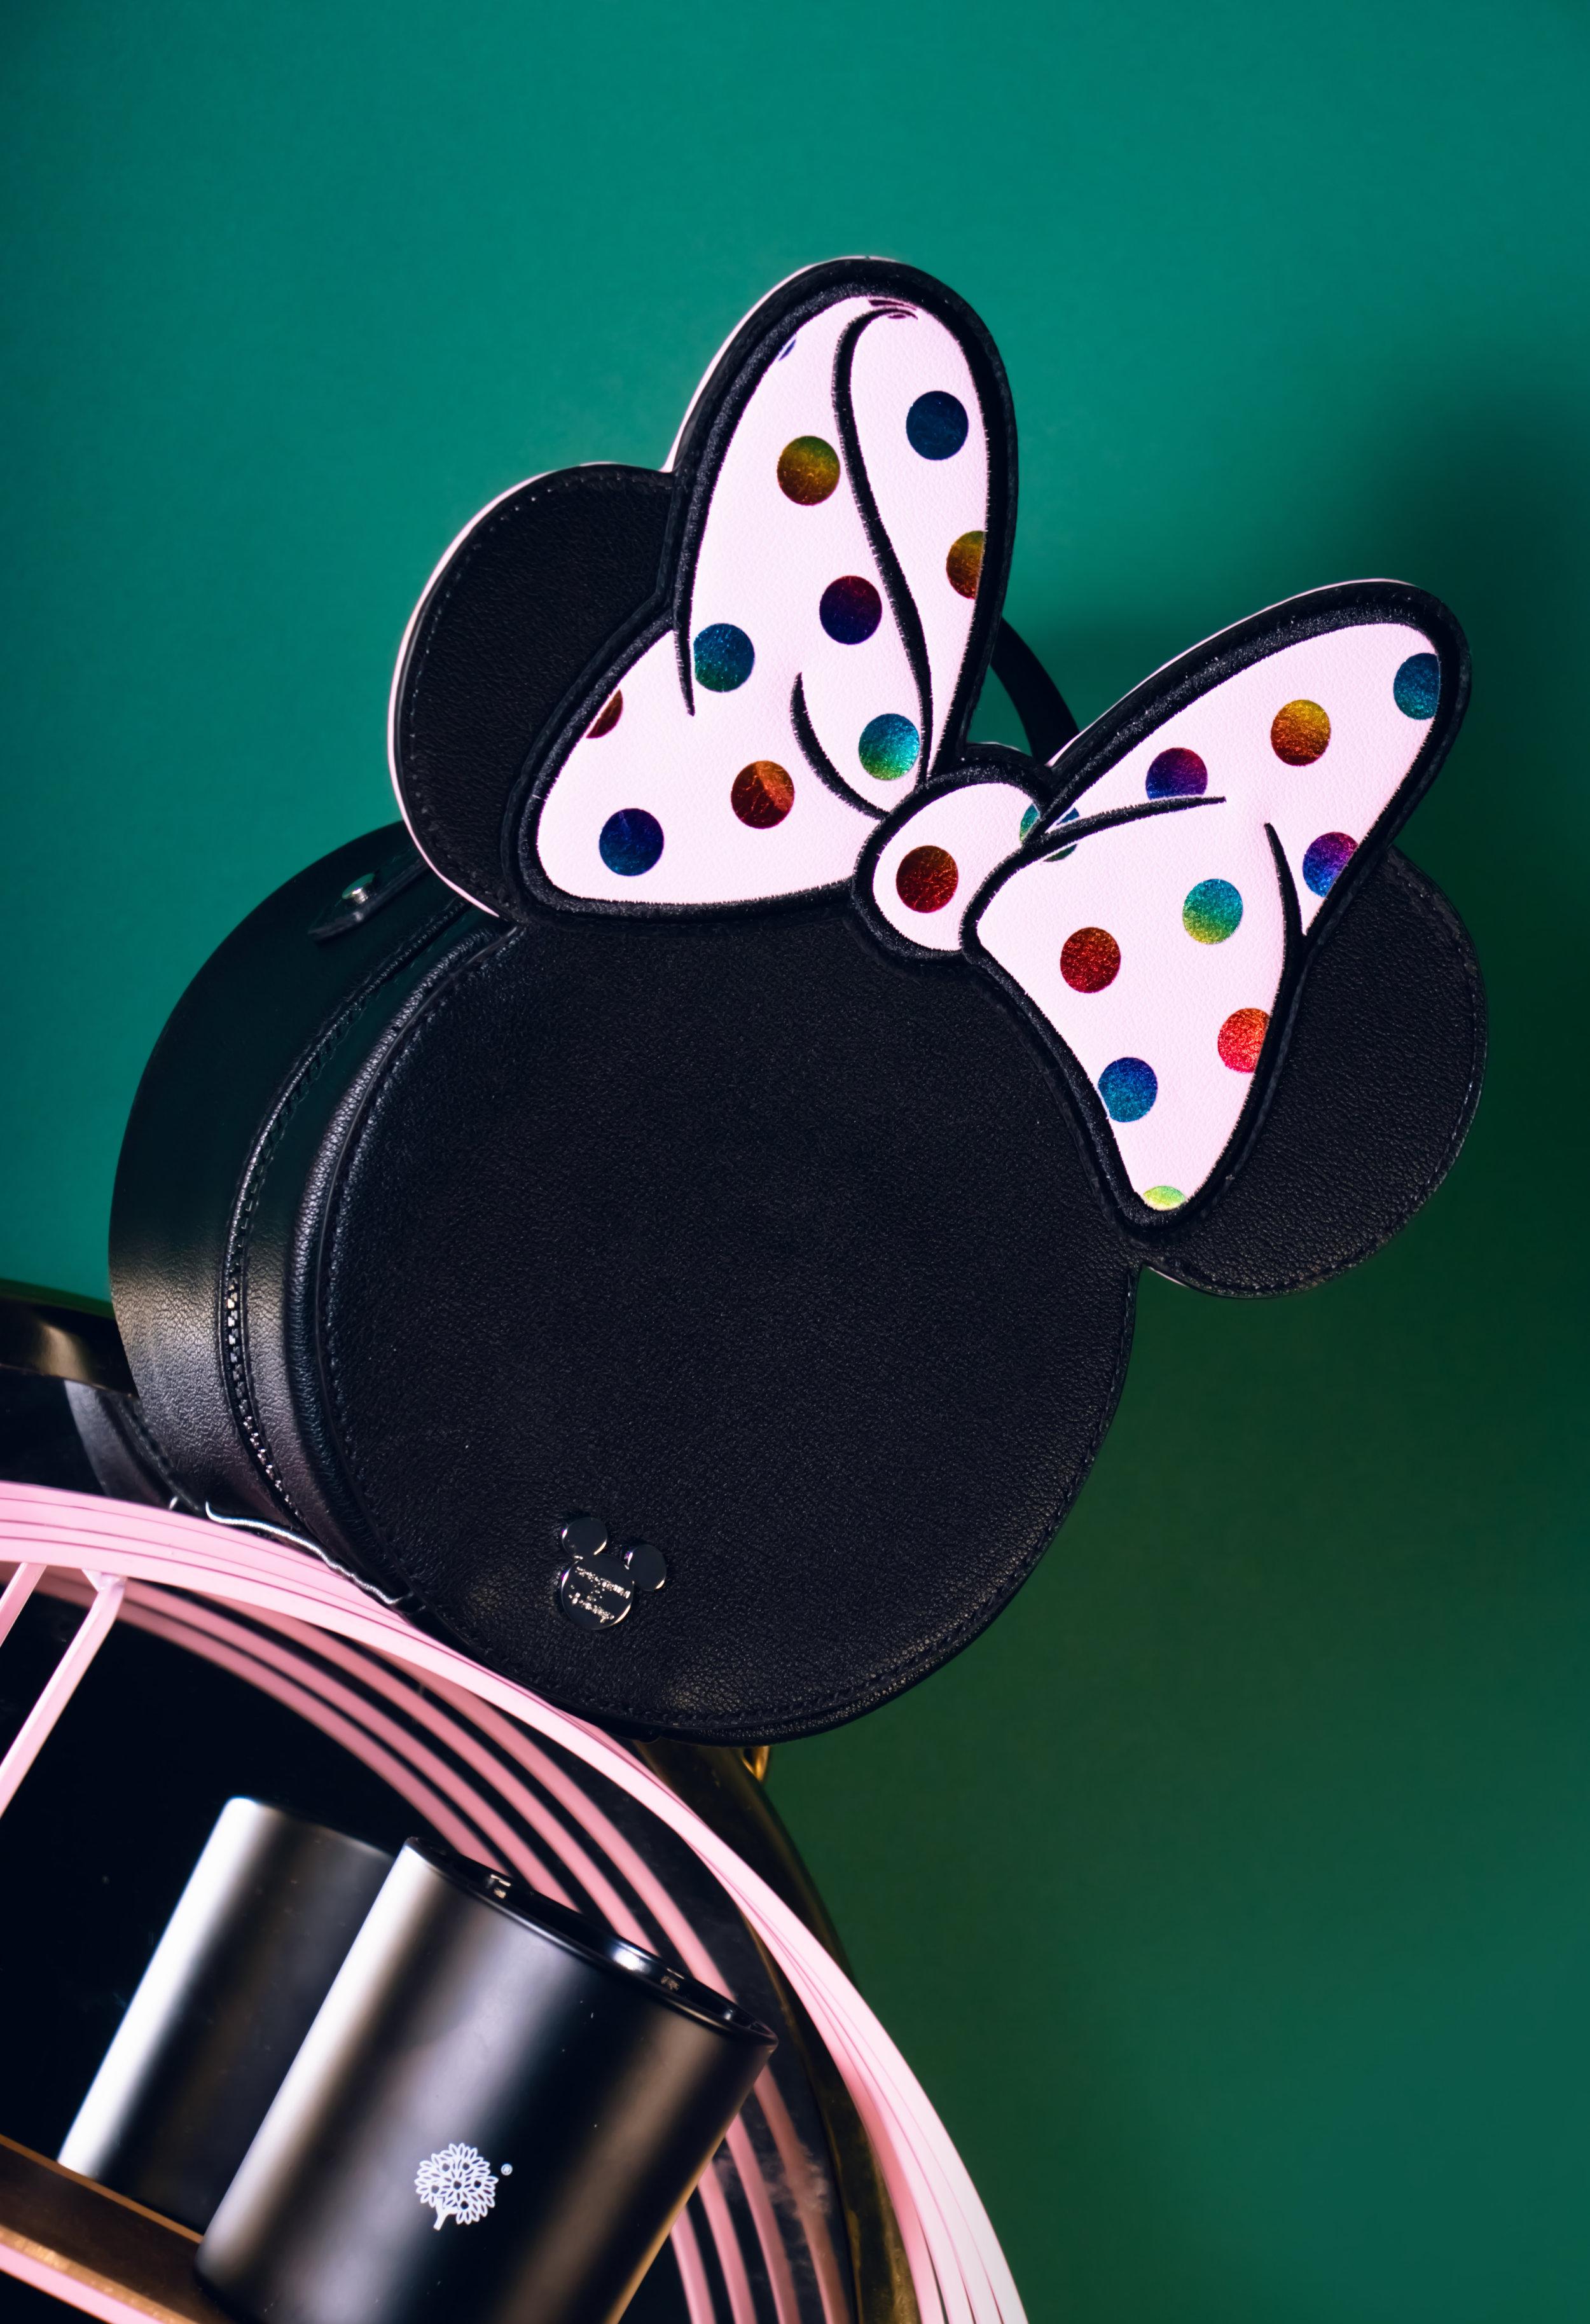 Spectrum minnie mouse vanity case.jpg